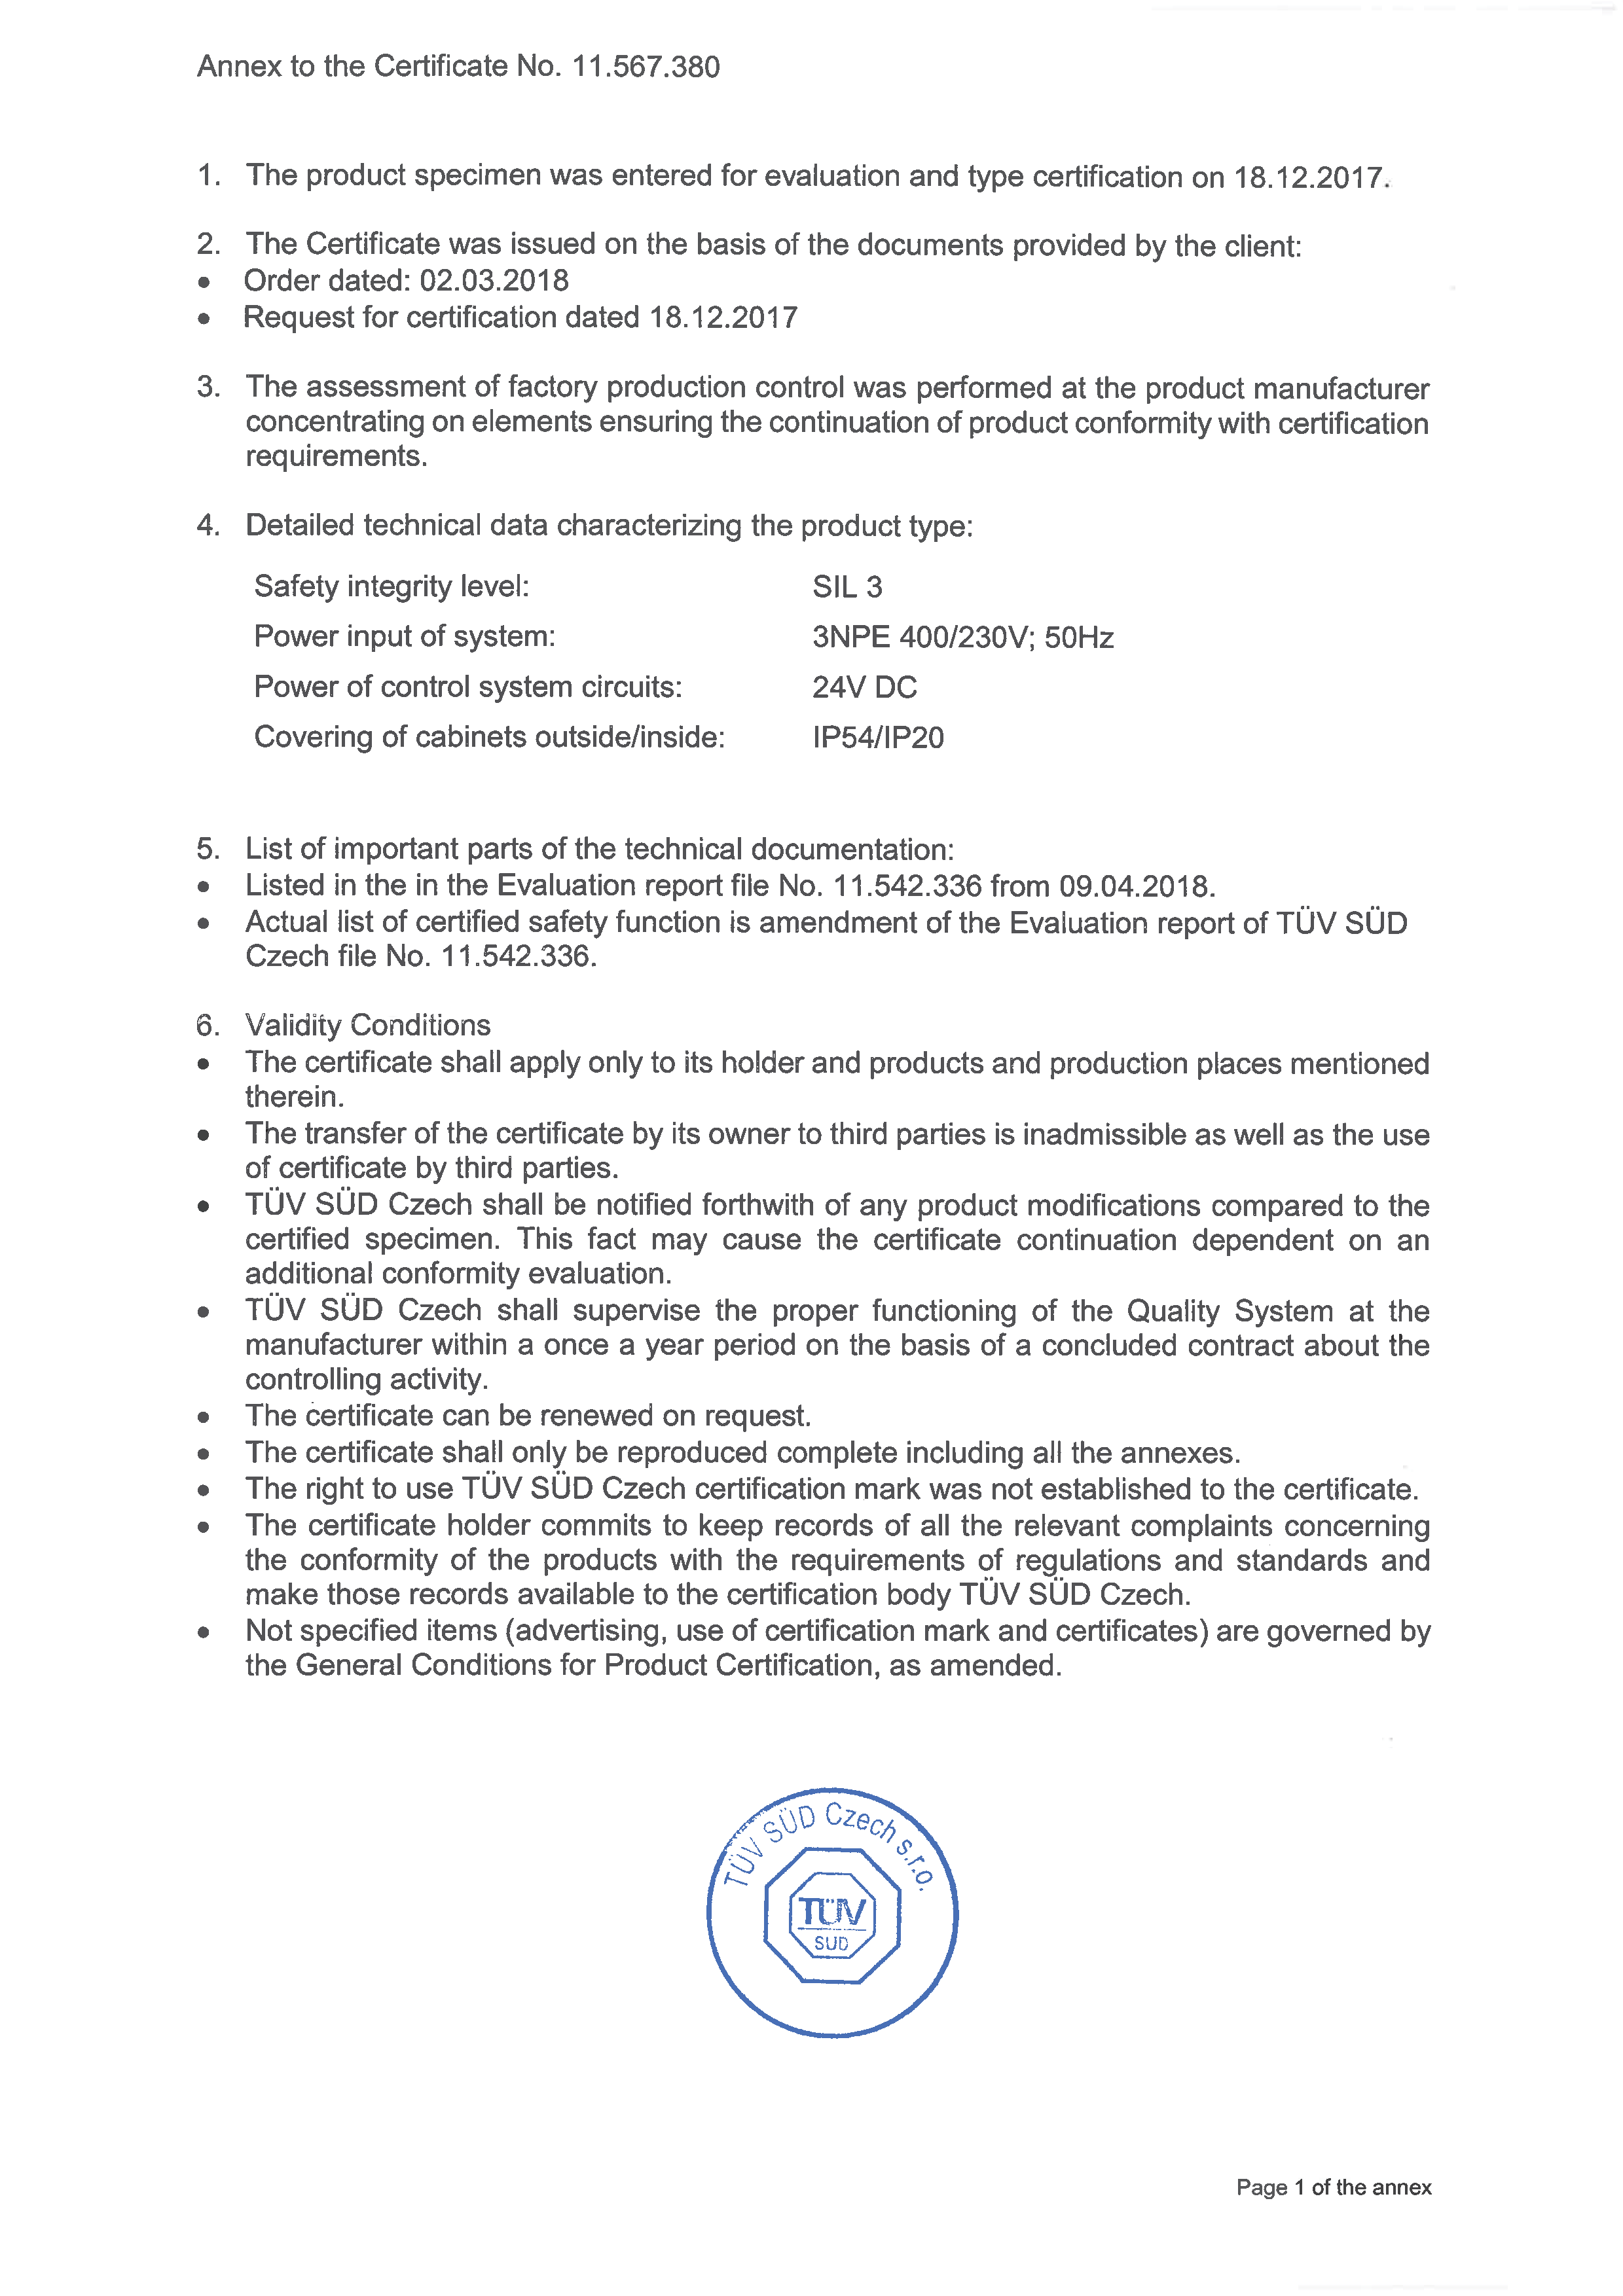 SIL 3 certificate 2